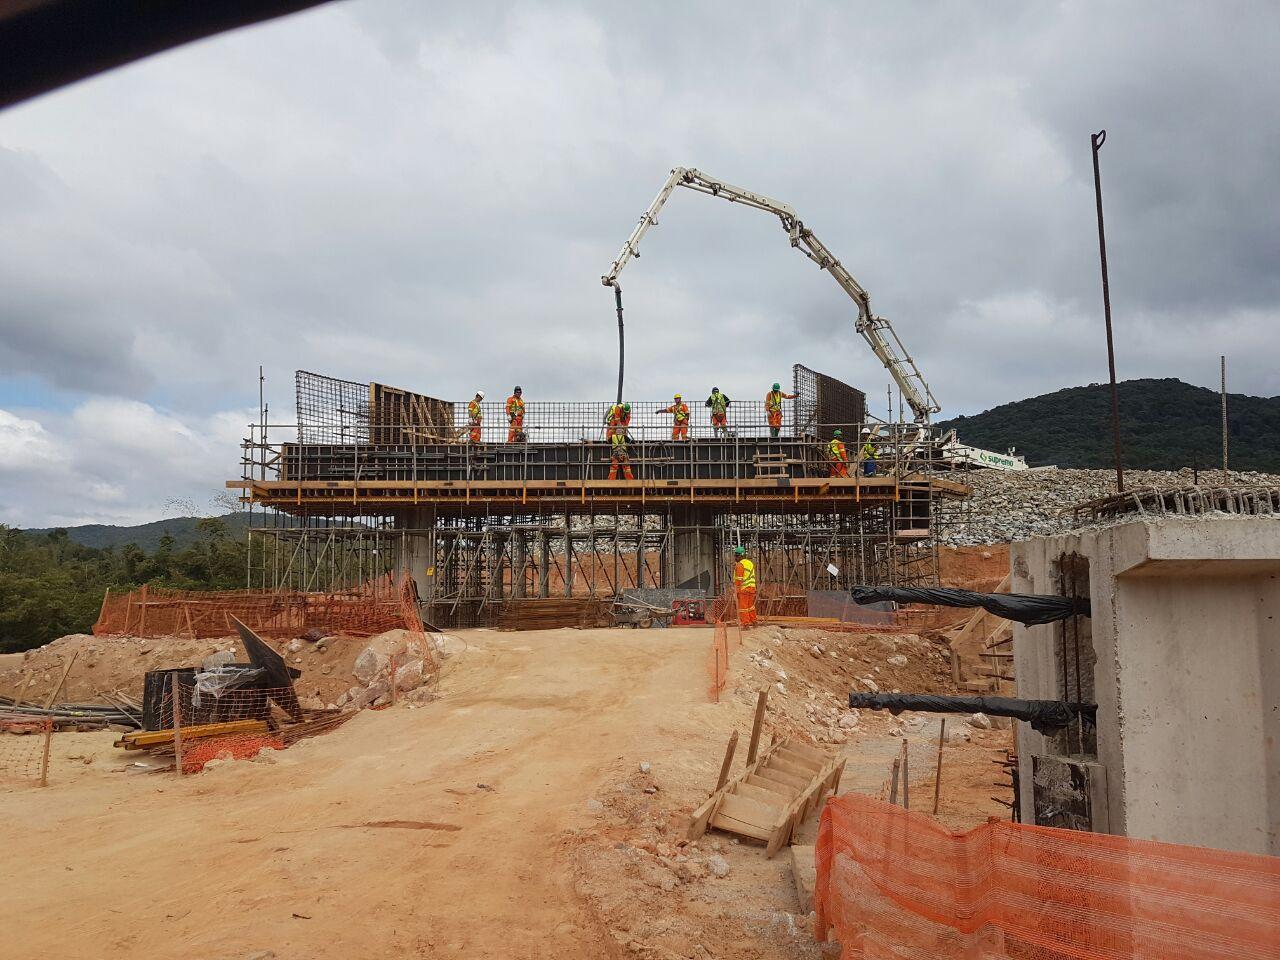 Contorno Florianópolis - PSU km 215+380 - Travessa